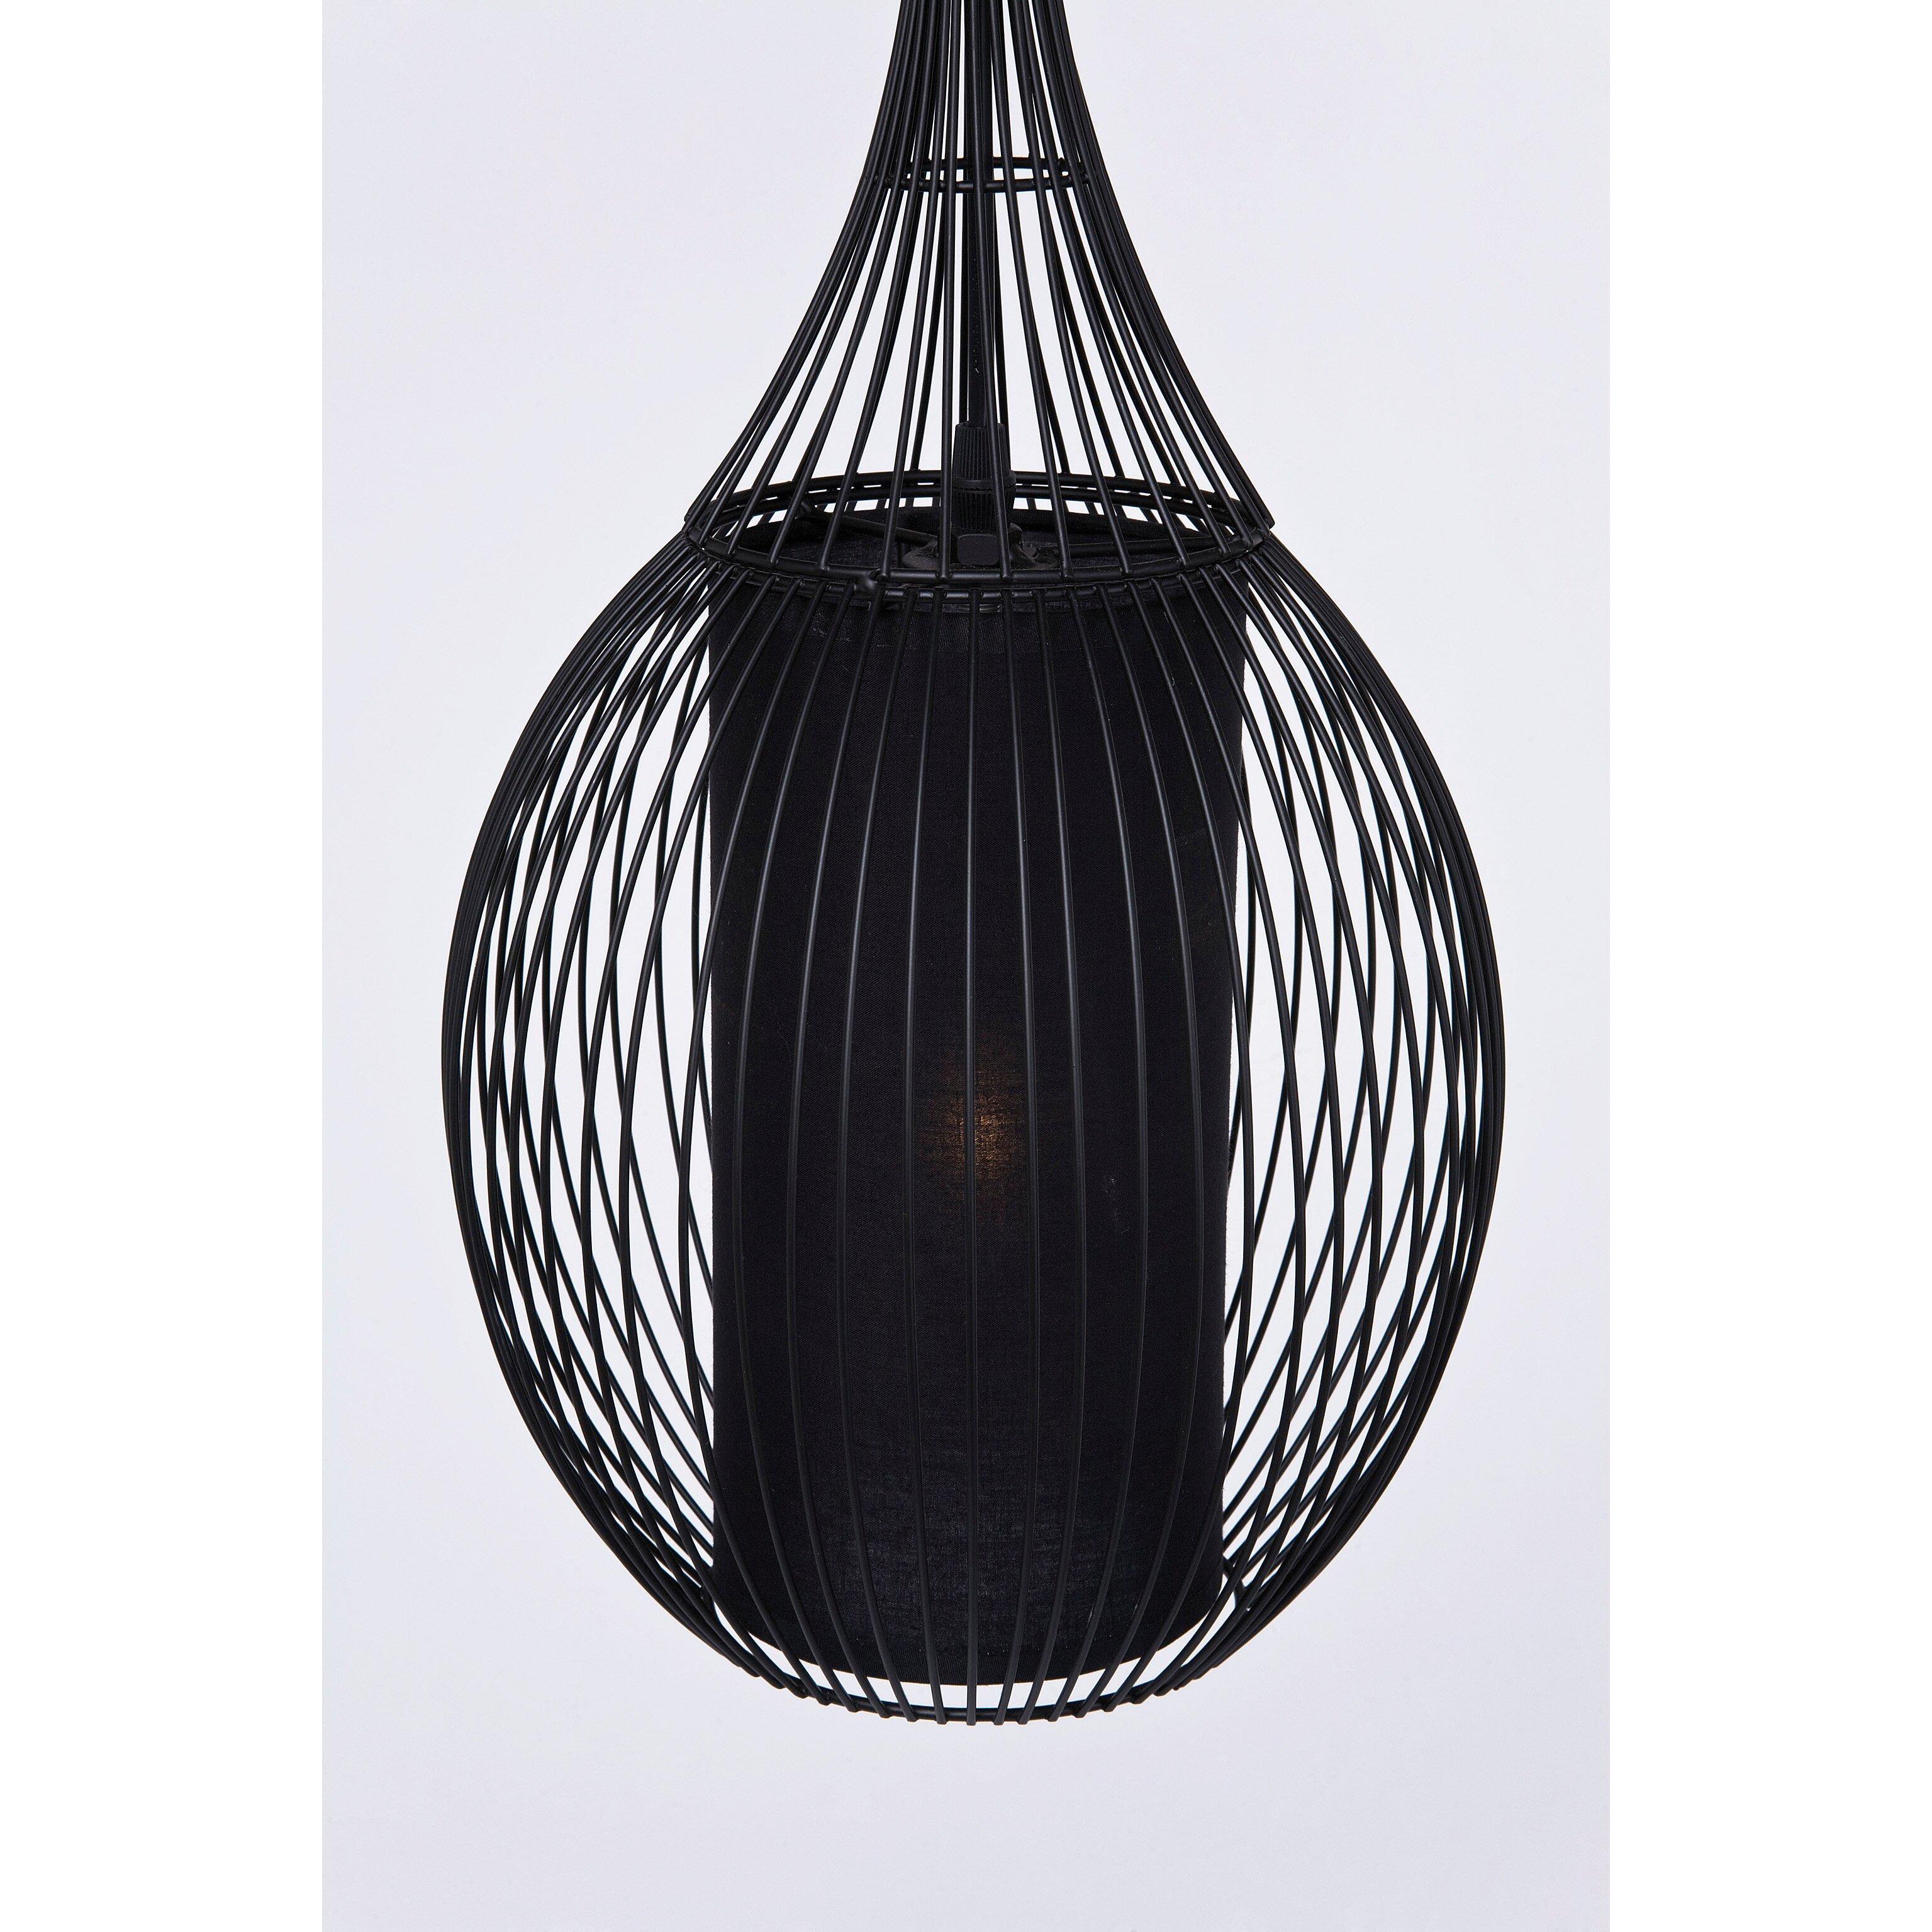 pendelleuchte 1 flammig swing iron von kare design. Black Bedroom Furniture Sets. Home Design Ideas